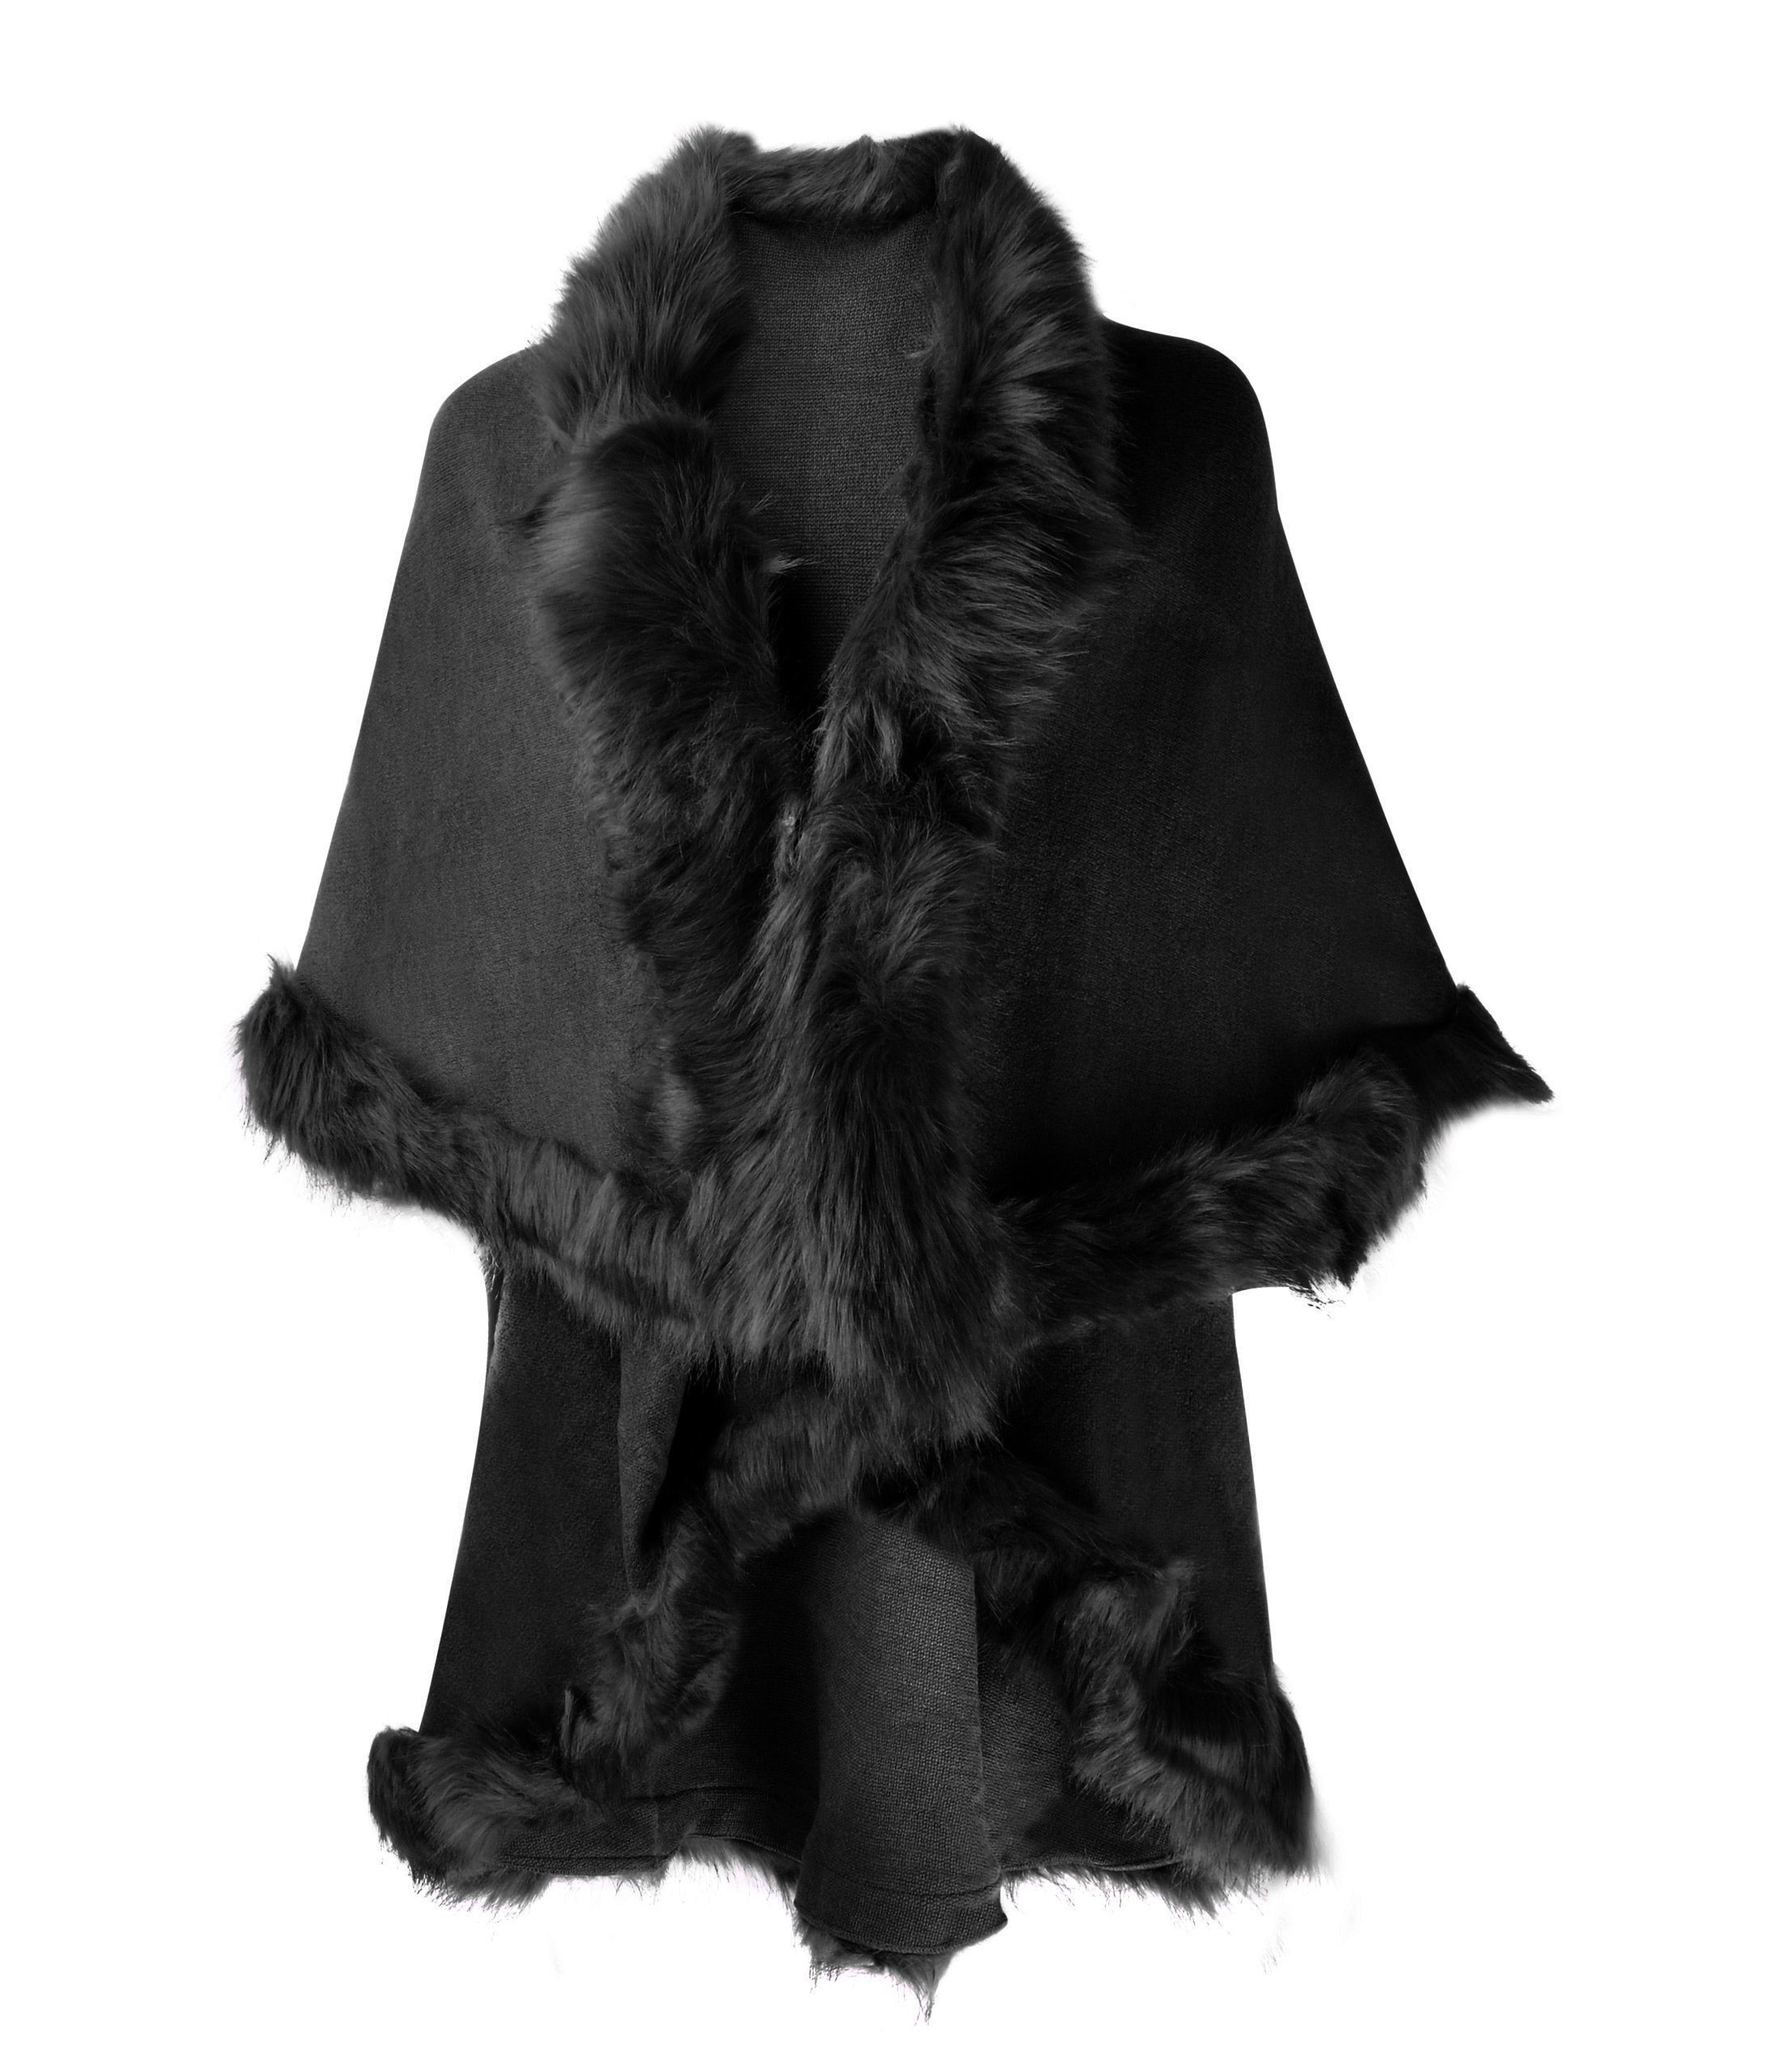 ZLYC Women Fine Knit Open Front Faux Fur Trim Layers Poncho Cape Cardigan Sweater (Black 2)